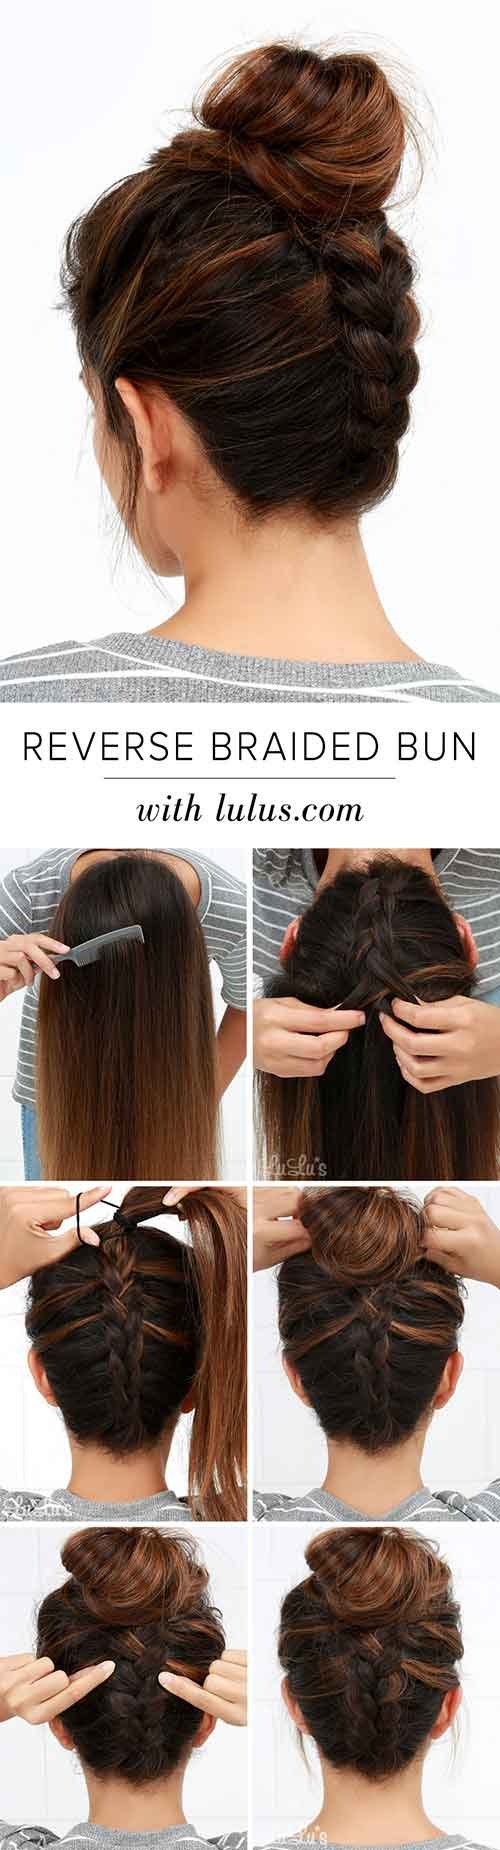 8. Reverse Braid